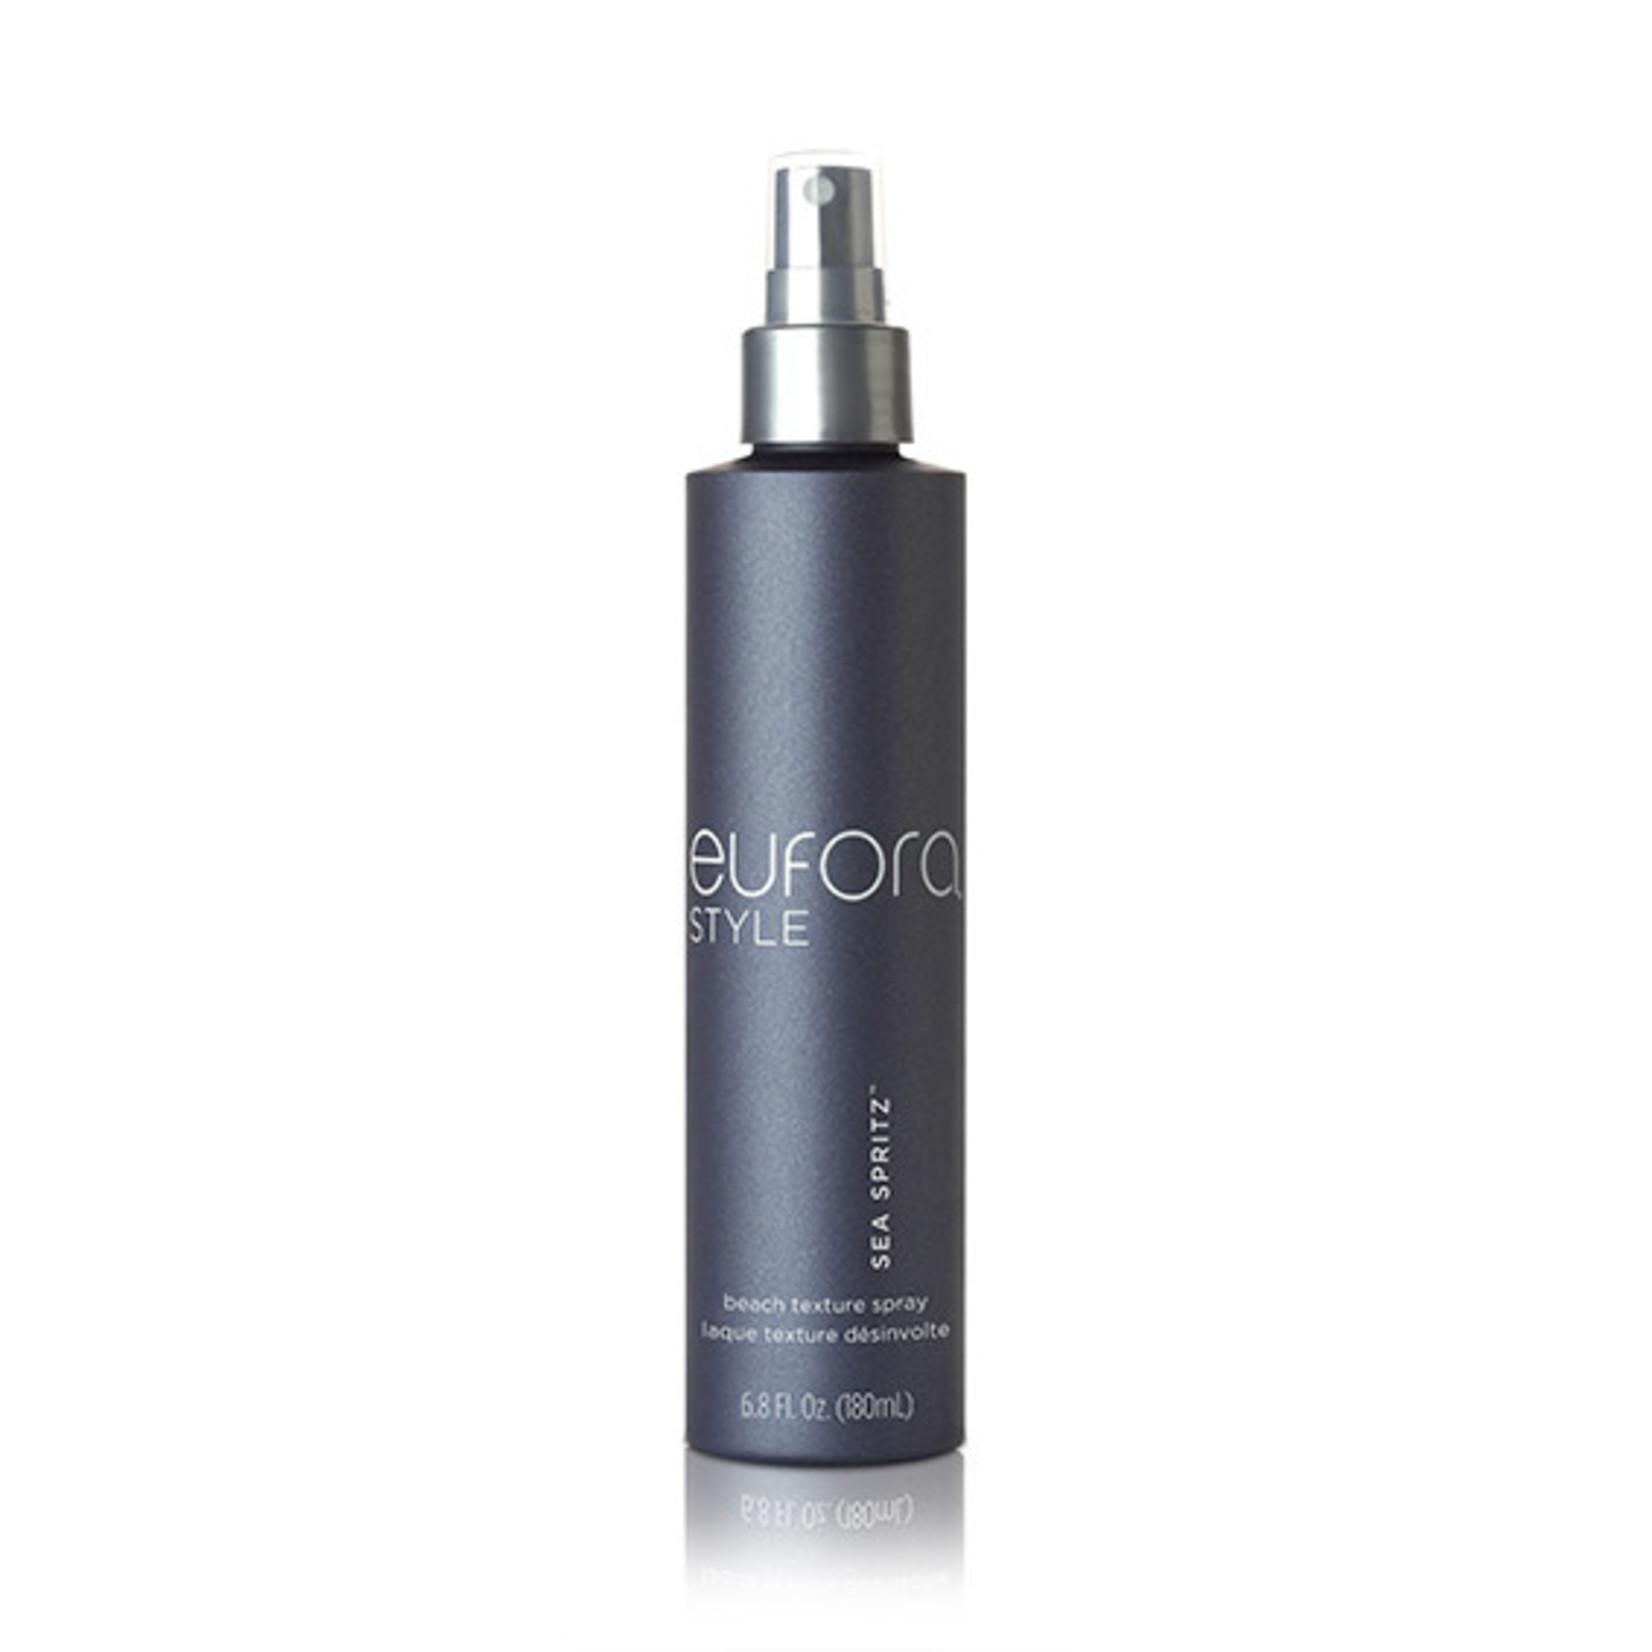 Eufora EuforaStyle Sea Spritz Beach Texture Spray